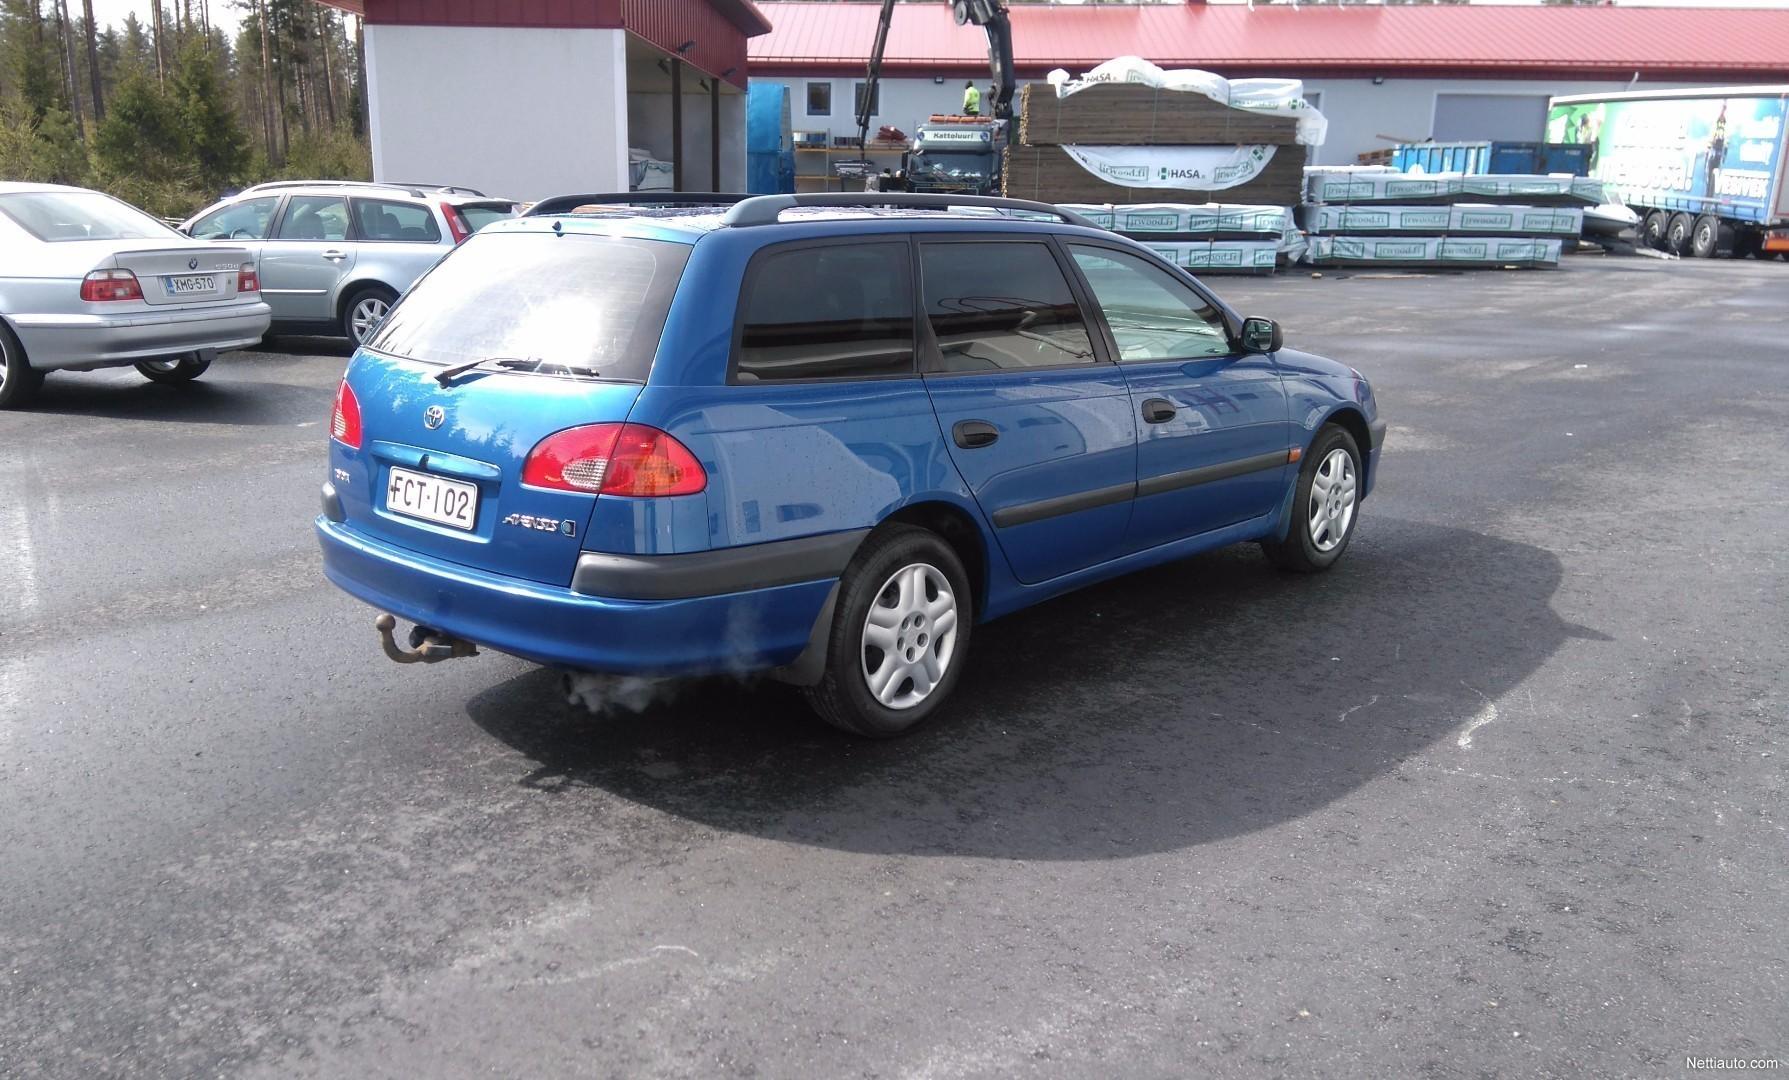 toyota avensis 1 8 terra wagon 5d station wagon 1998 used vehicle nettiauto. Black Bedroom Furniture Sets. Home Design Ideas